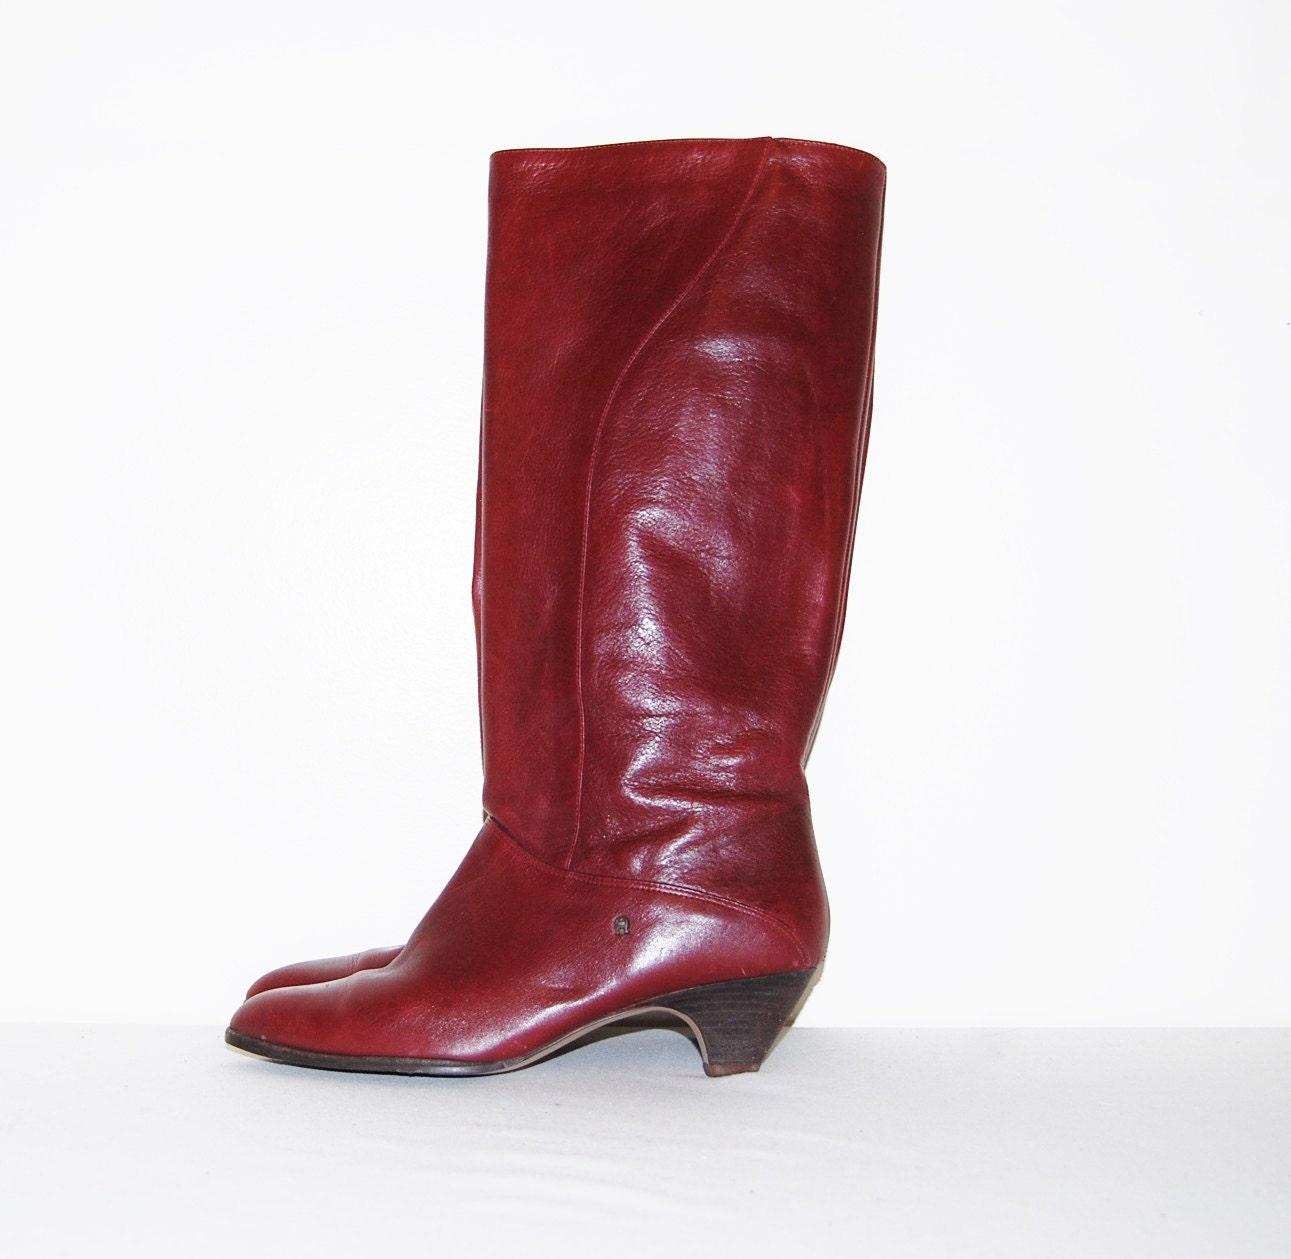 vintage boots etienne aigner oxblood leather